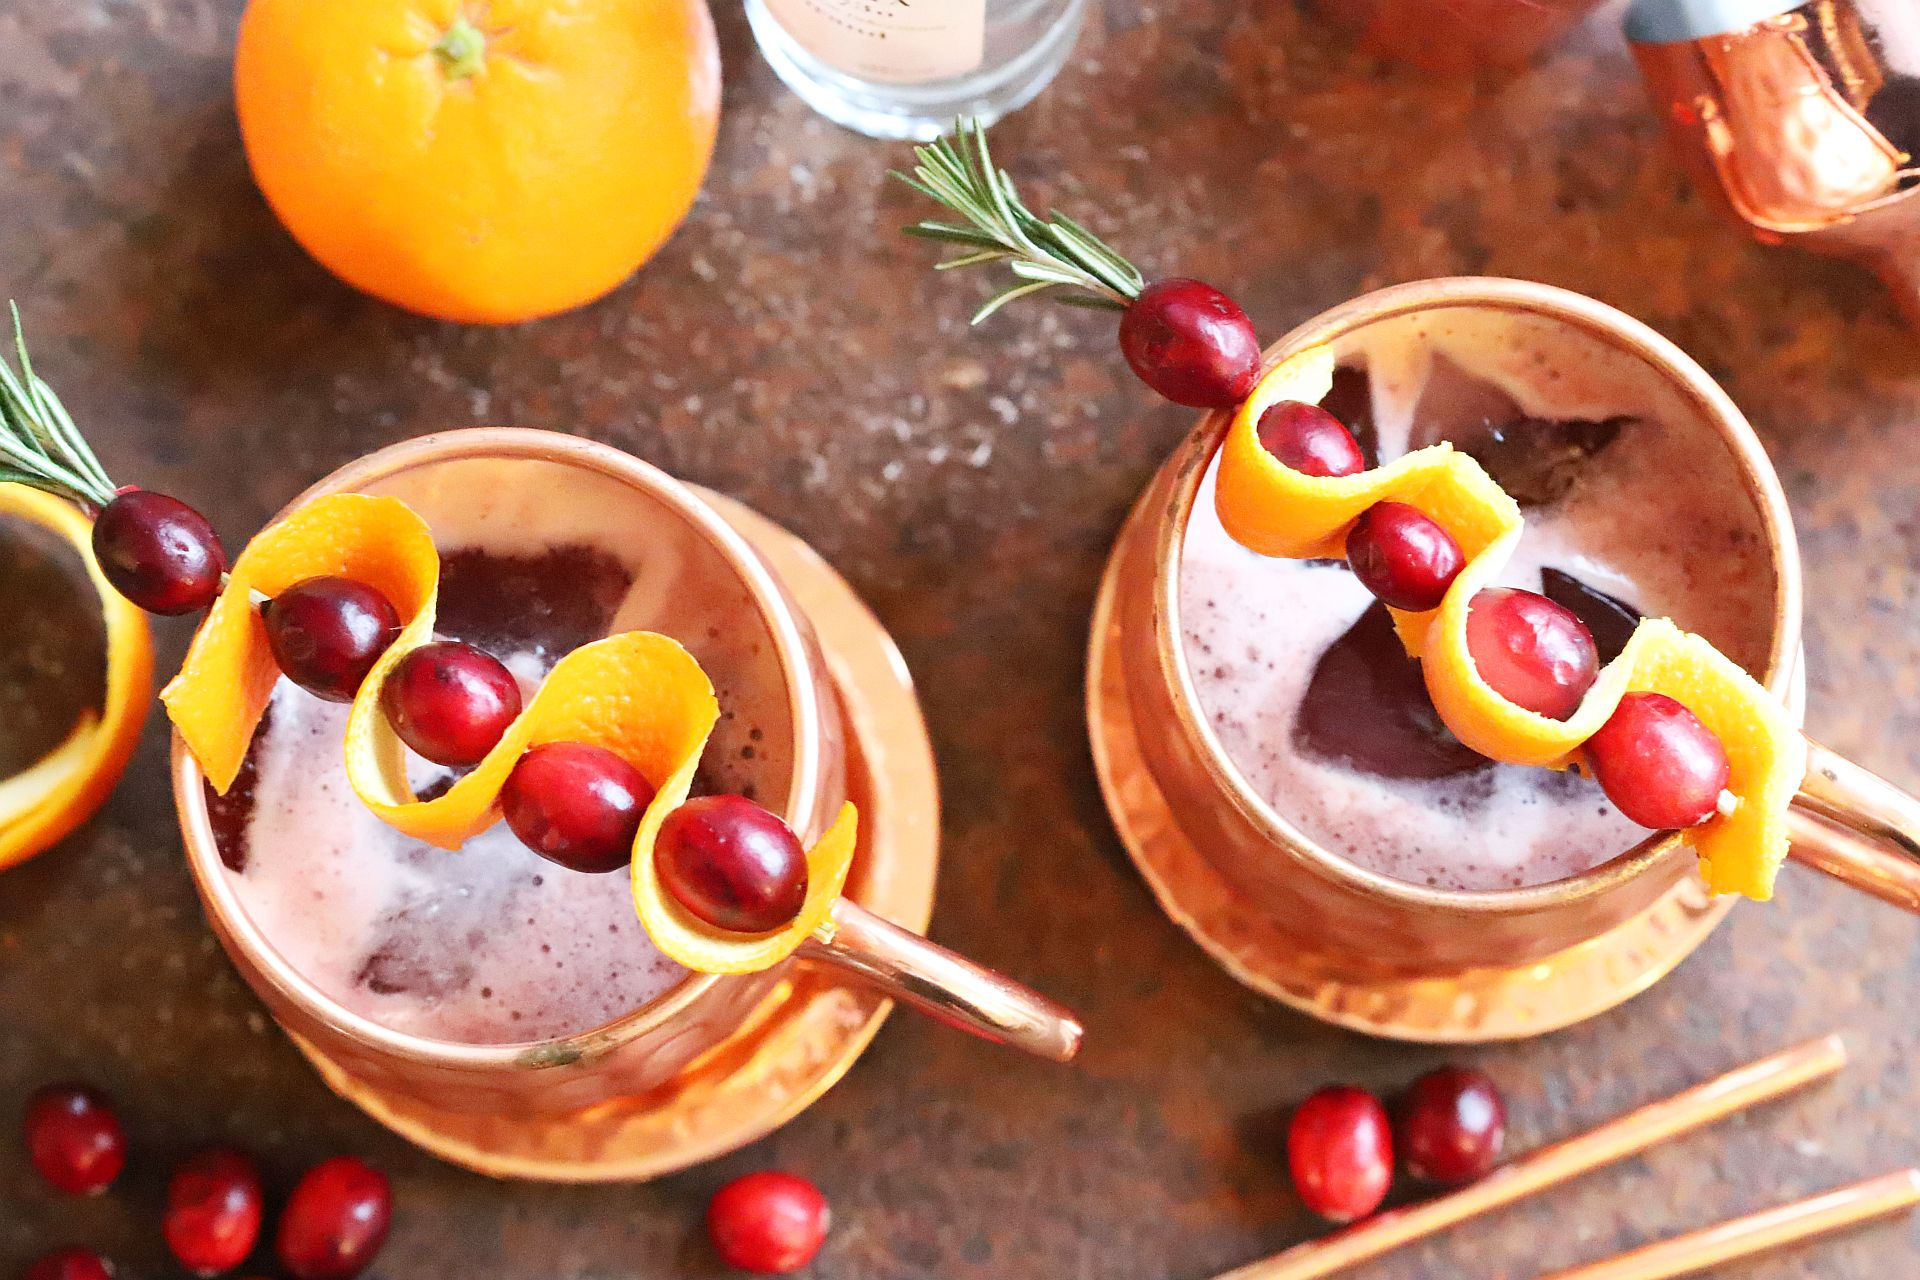 easy peasy rezept f r graue wintertage pink orange moscow mule. Black Bedroom Furniture Sets. Home Design Ideas